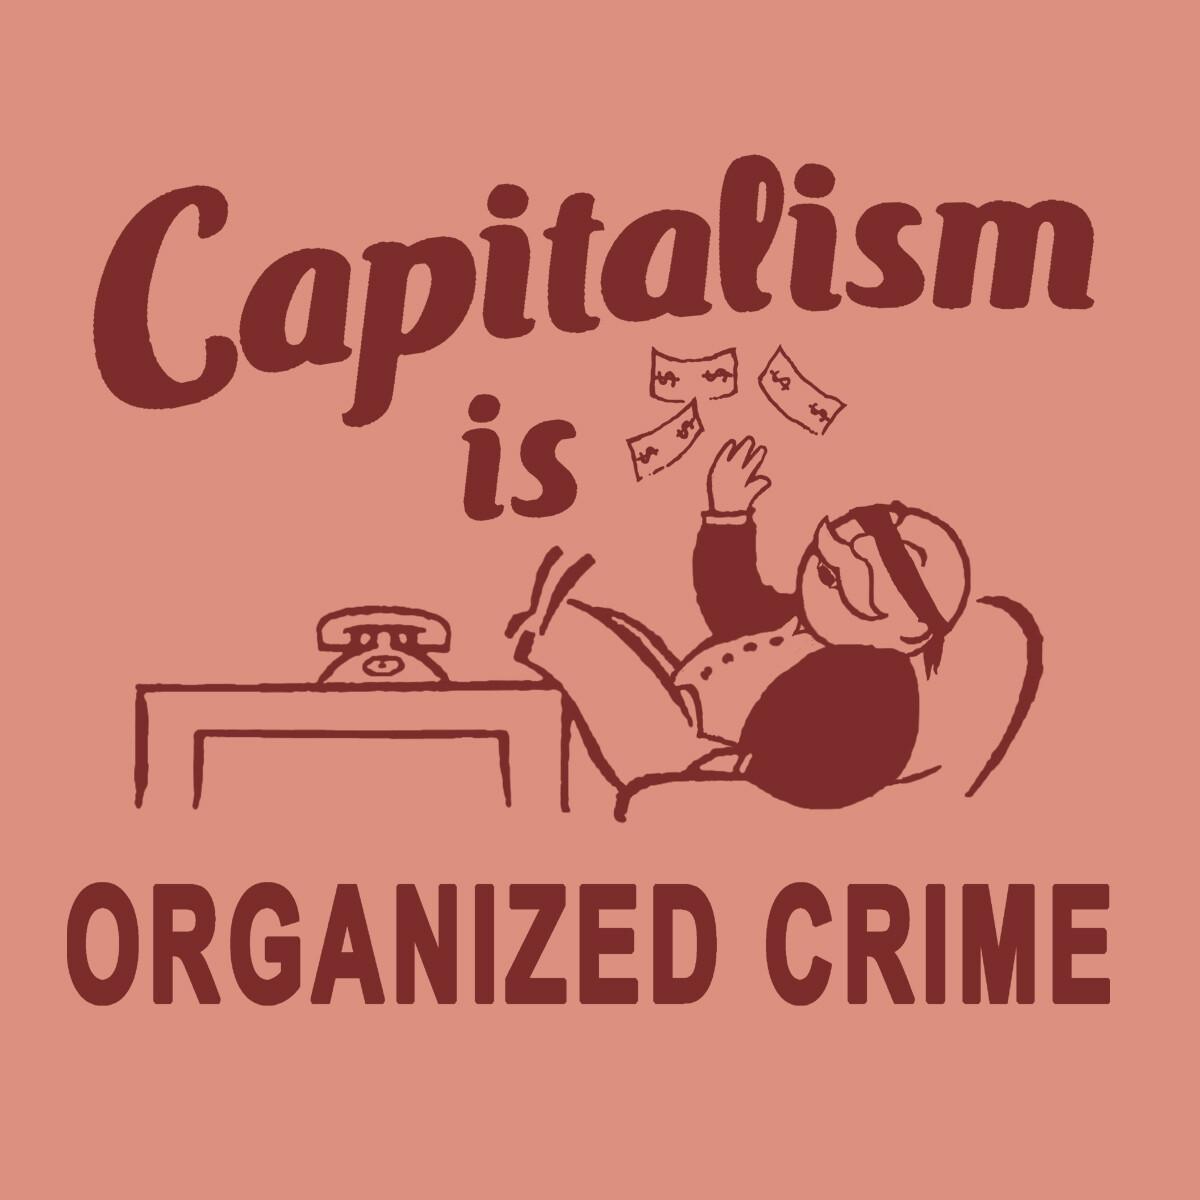 CAPITALISM the shirt